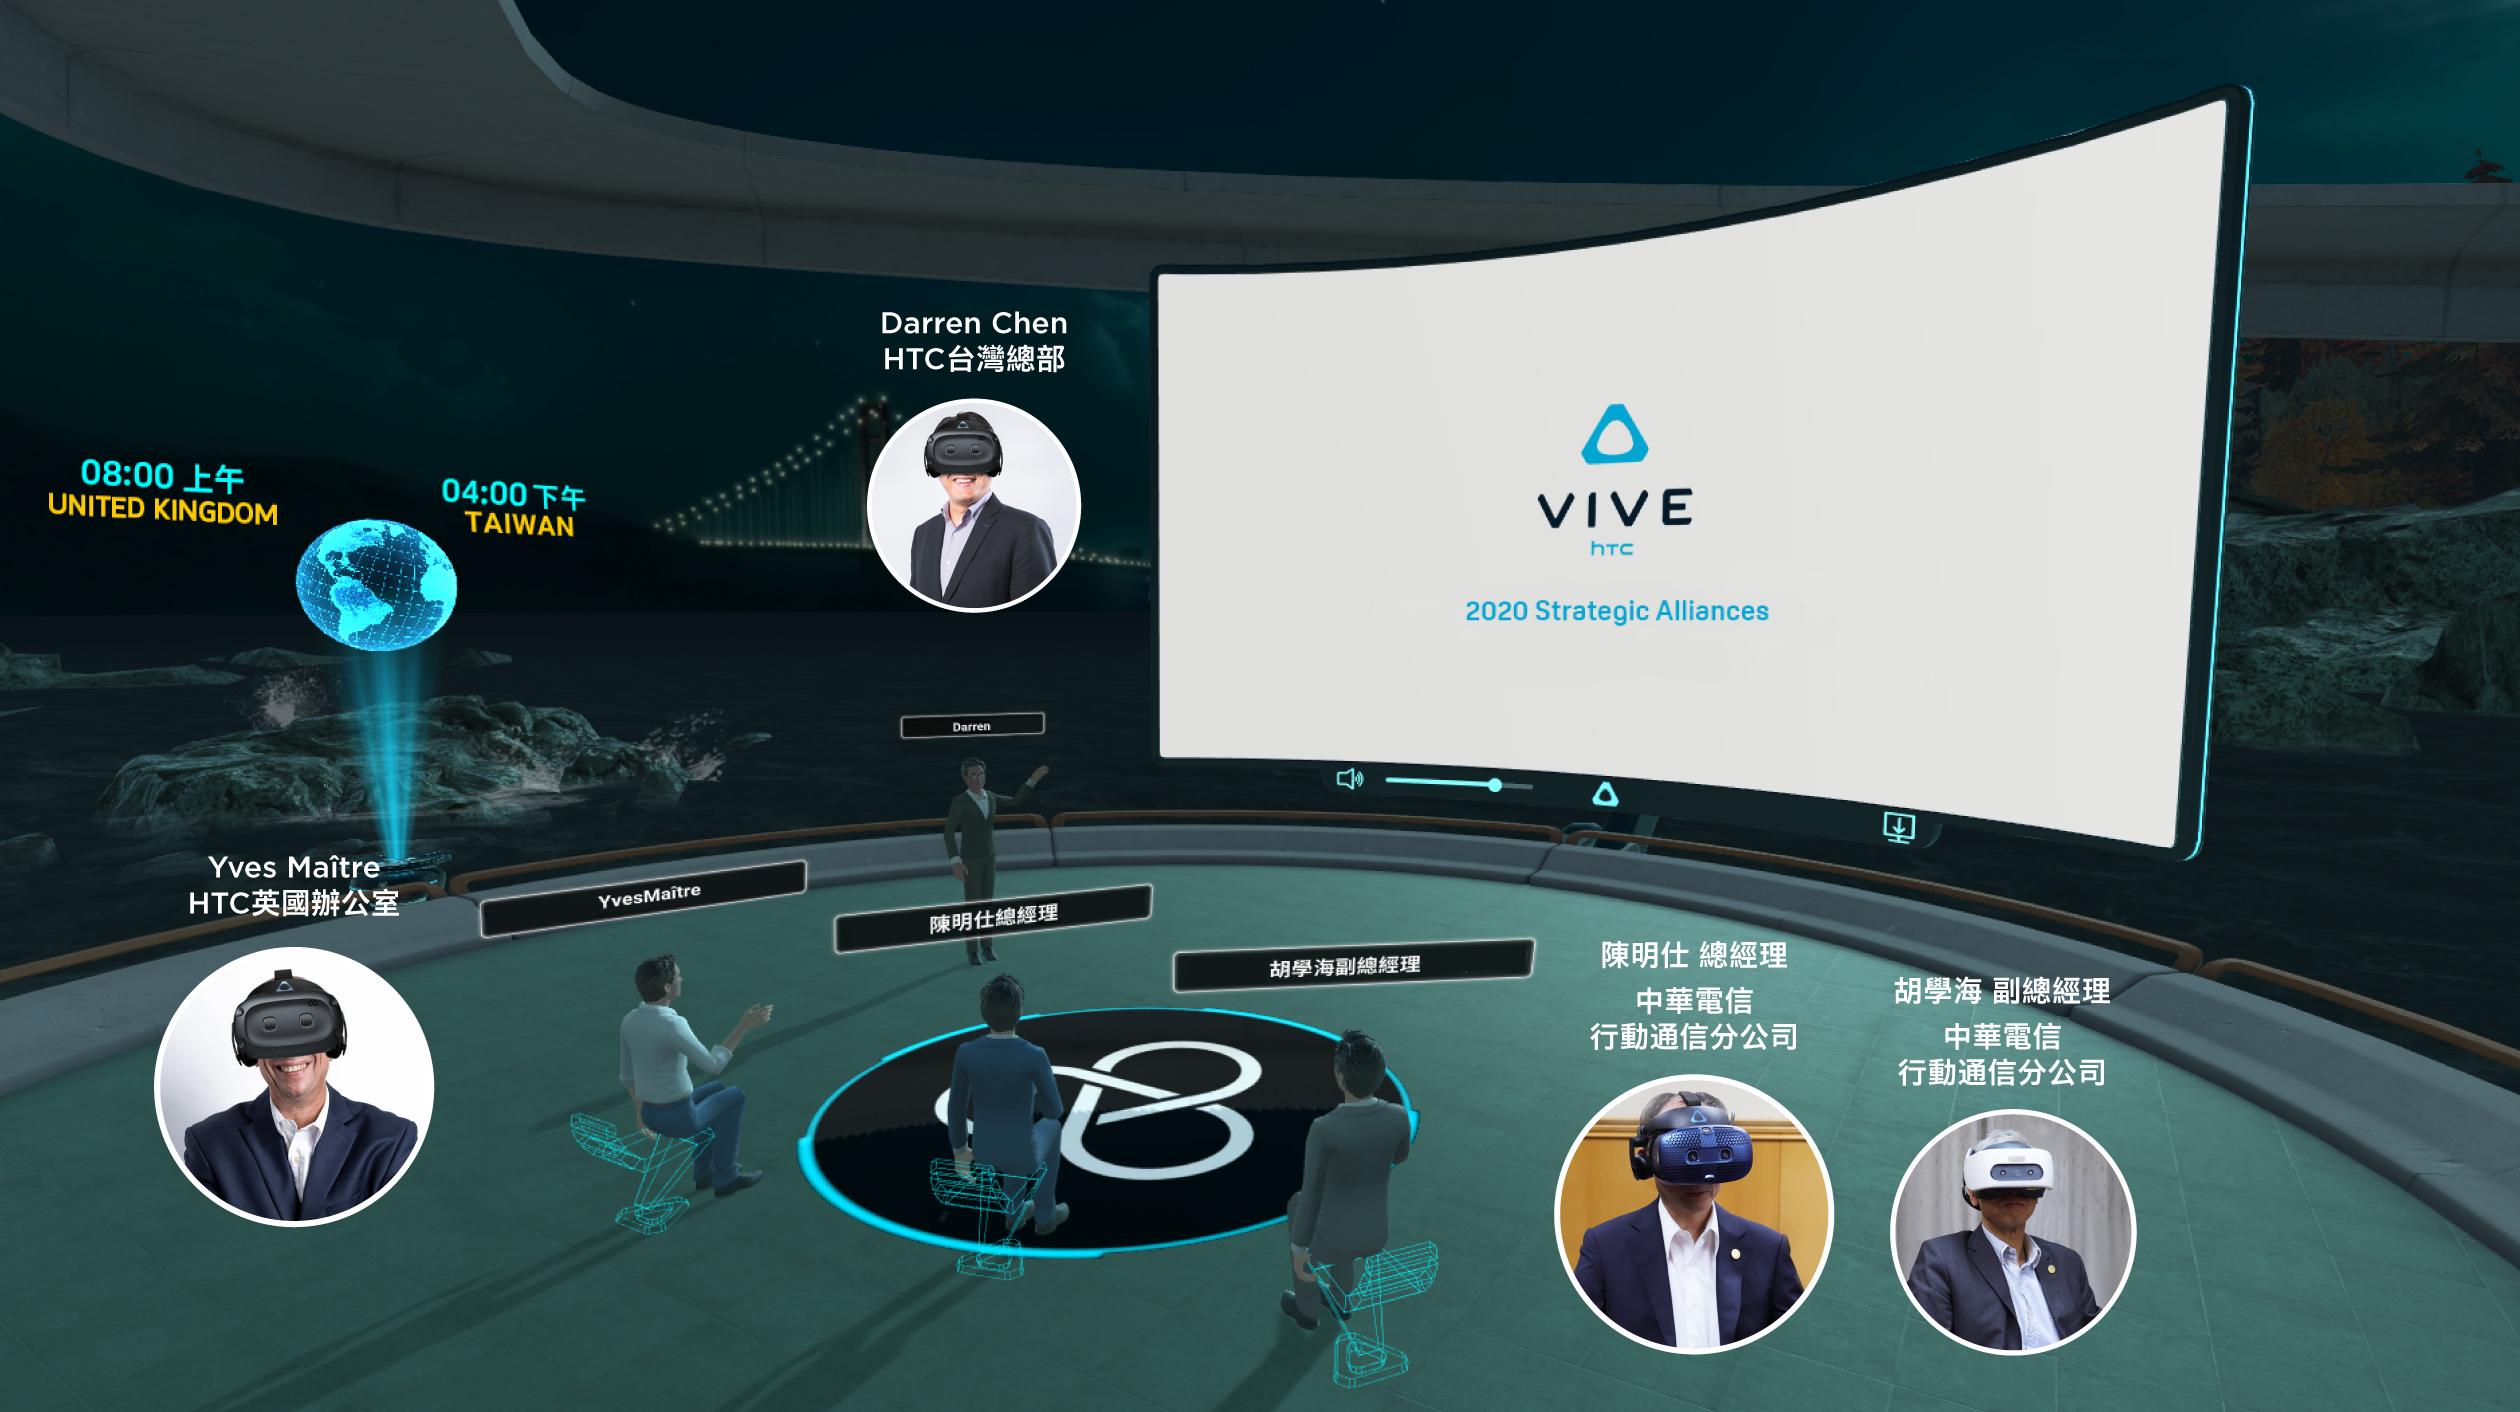 HTC新聞圖檔2(中華電信行動通信分公司總經理陳明仕及副總經理胡學海、HTC執行長Yves Maître及HTC台灣區總經理陳柏諭以VR虛擬會議方式進行2020 5G策略會談)